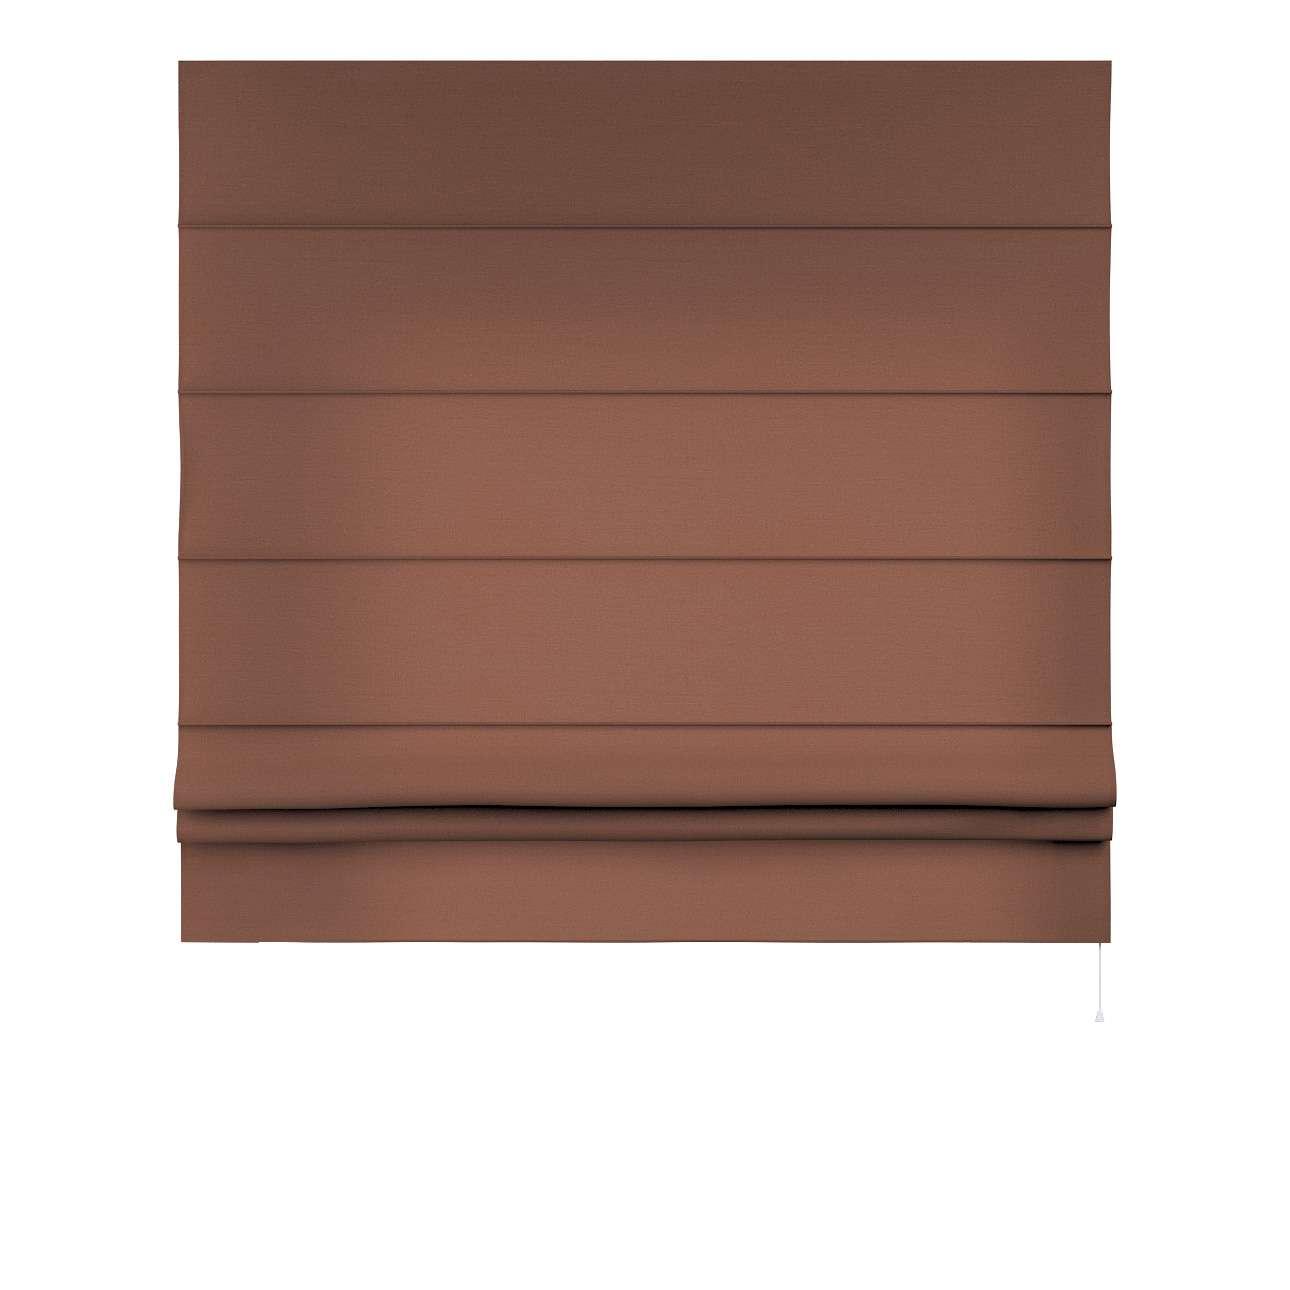 Raffrollo Padva 80 x 170 cm von der Kollektion Loneta, Stoff: 133-09